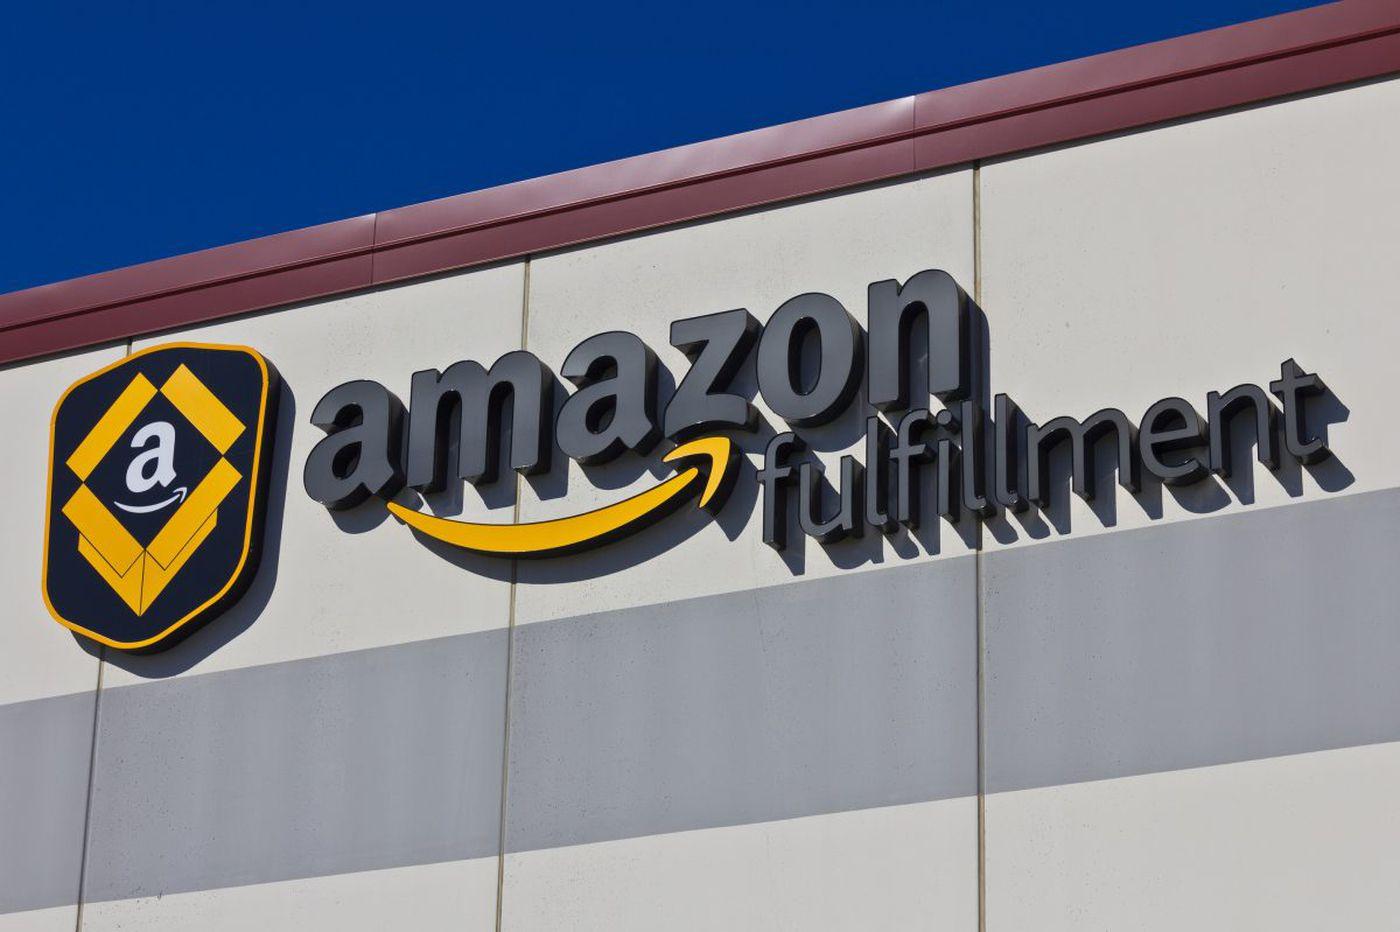 Where Philadelphia ranks among contenders for Amazon's new headquarters